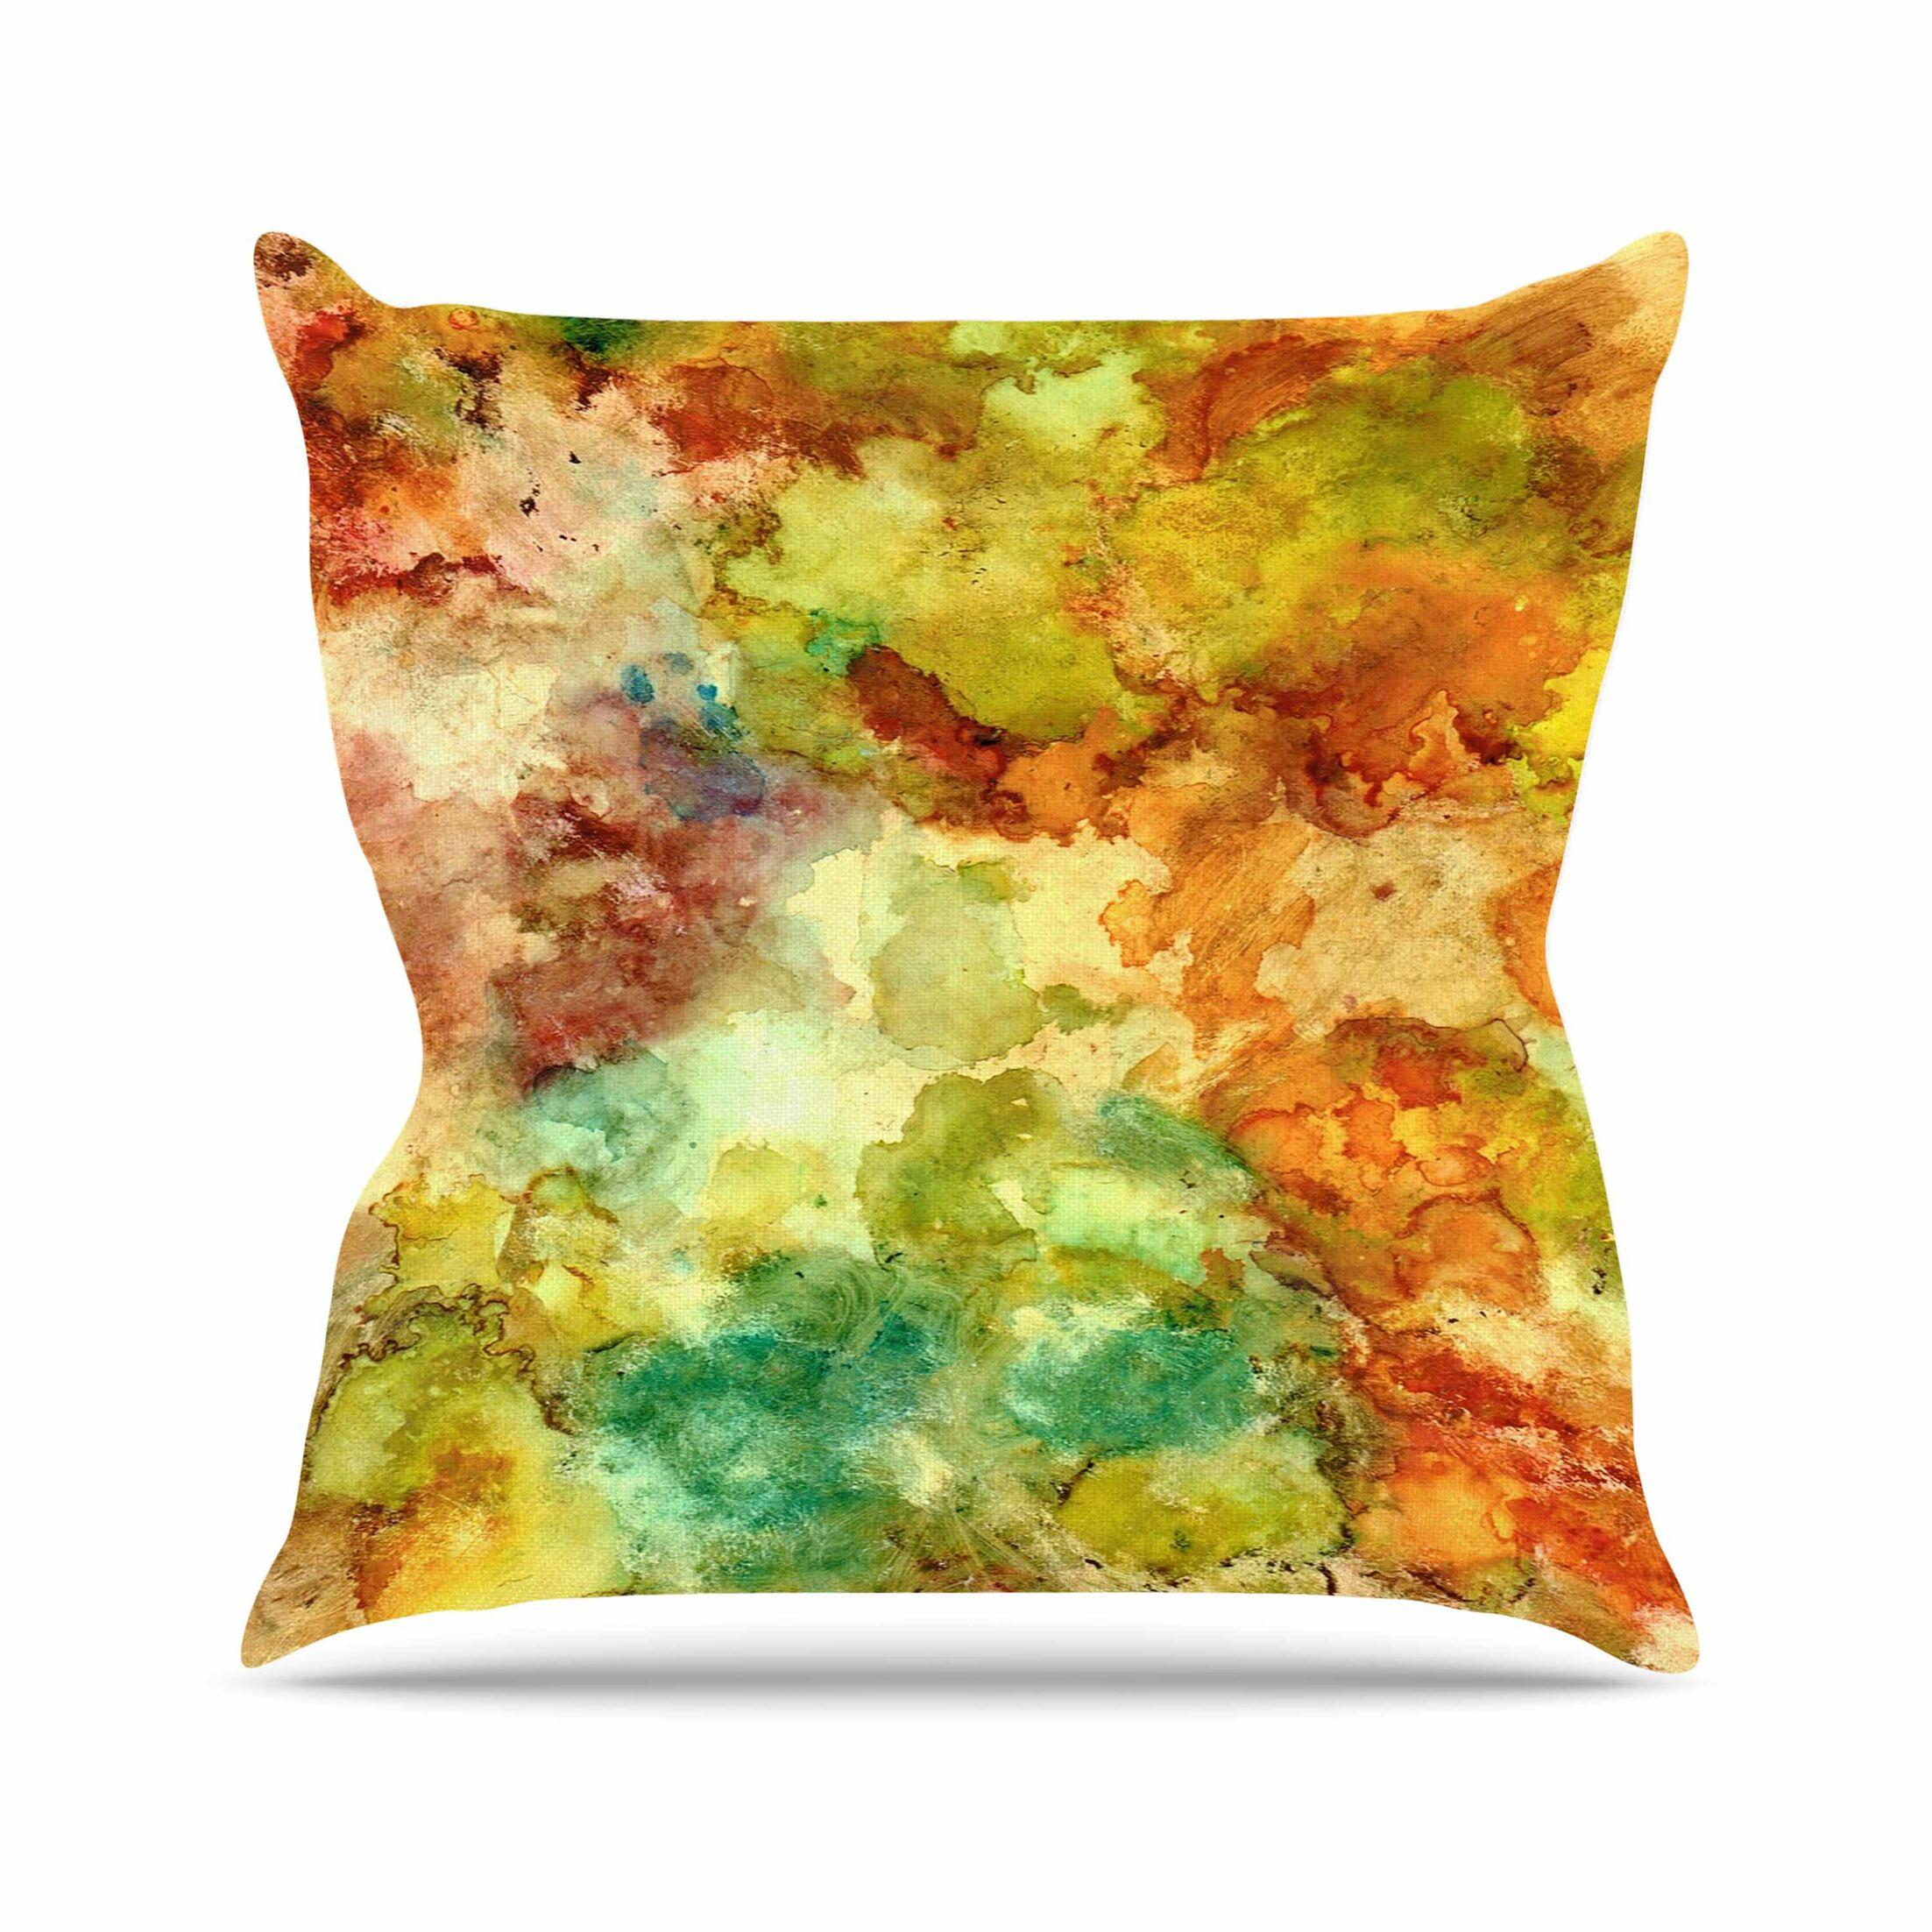 Fall Bouqet Throw Pillow Size: 20'' H x 20'' W